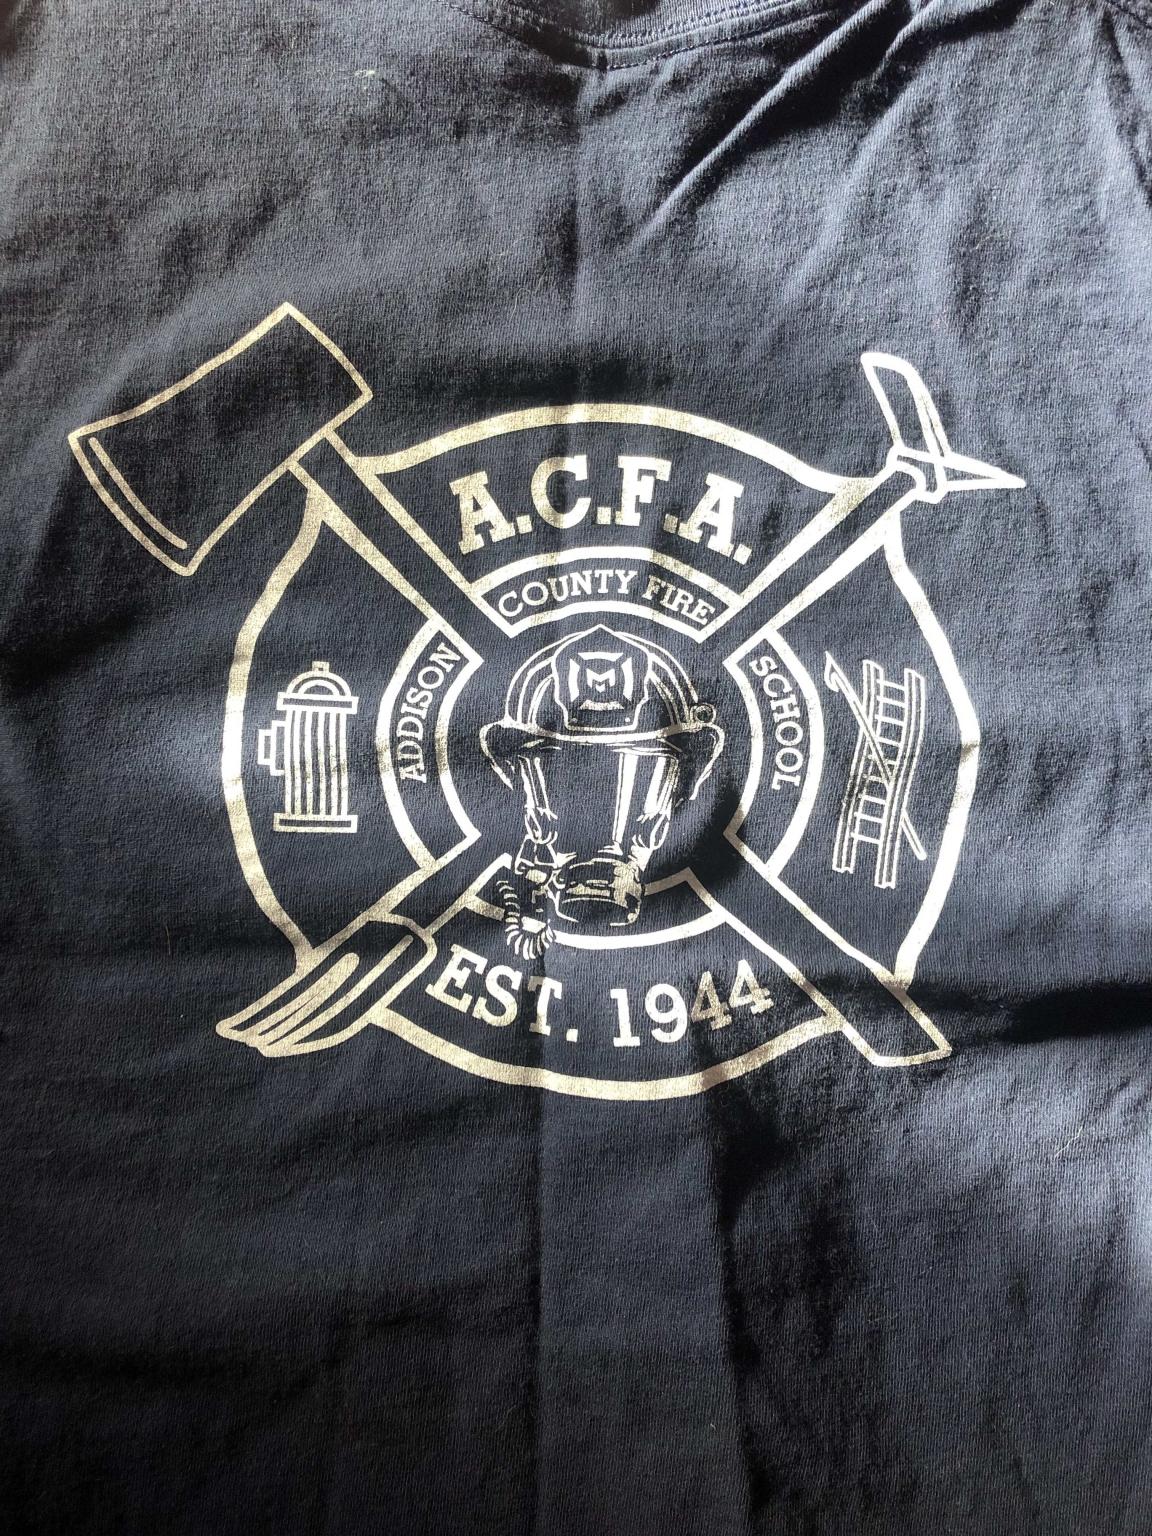 ACFA Regional School T-shirts